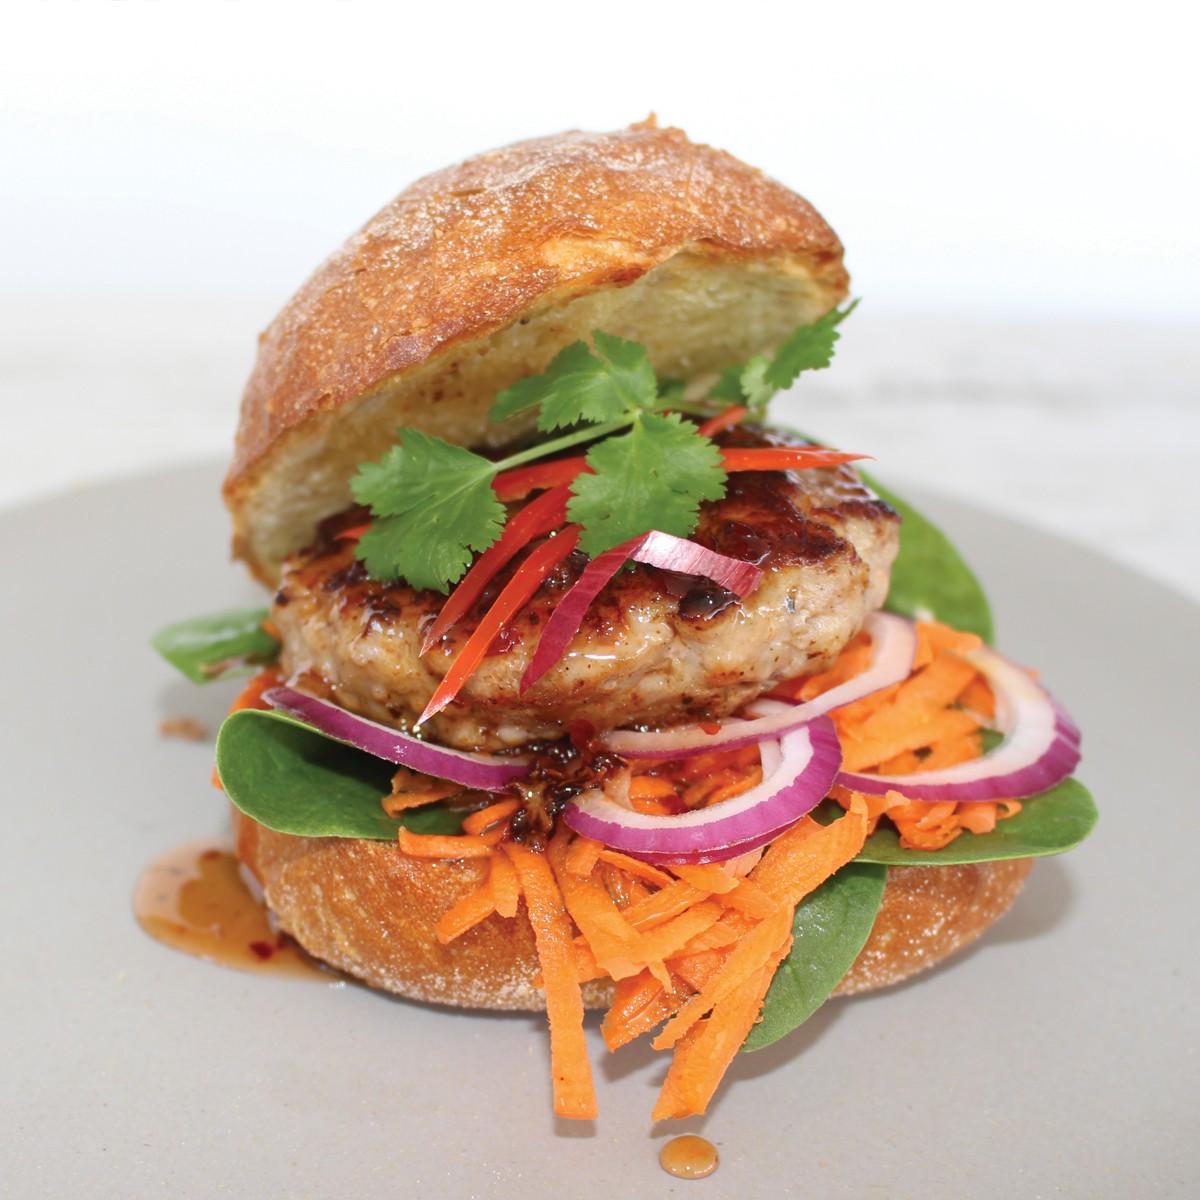 Asian Style Pork Burger with Chilli Jam - SunPork Pork Mince